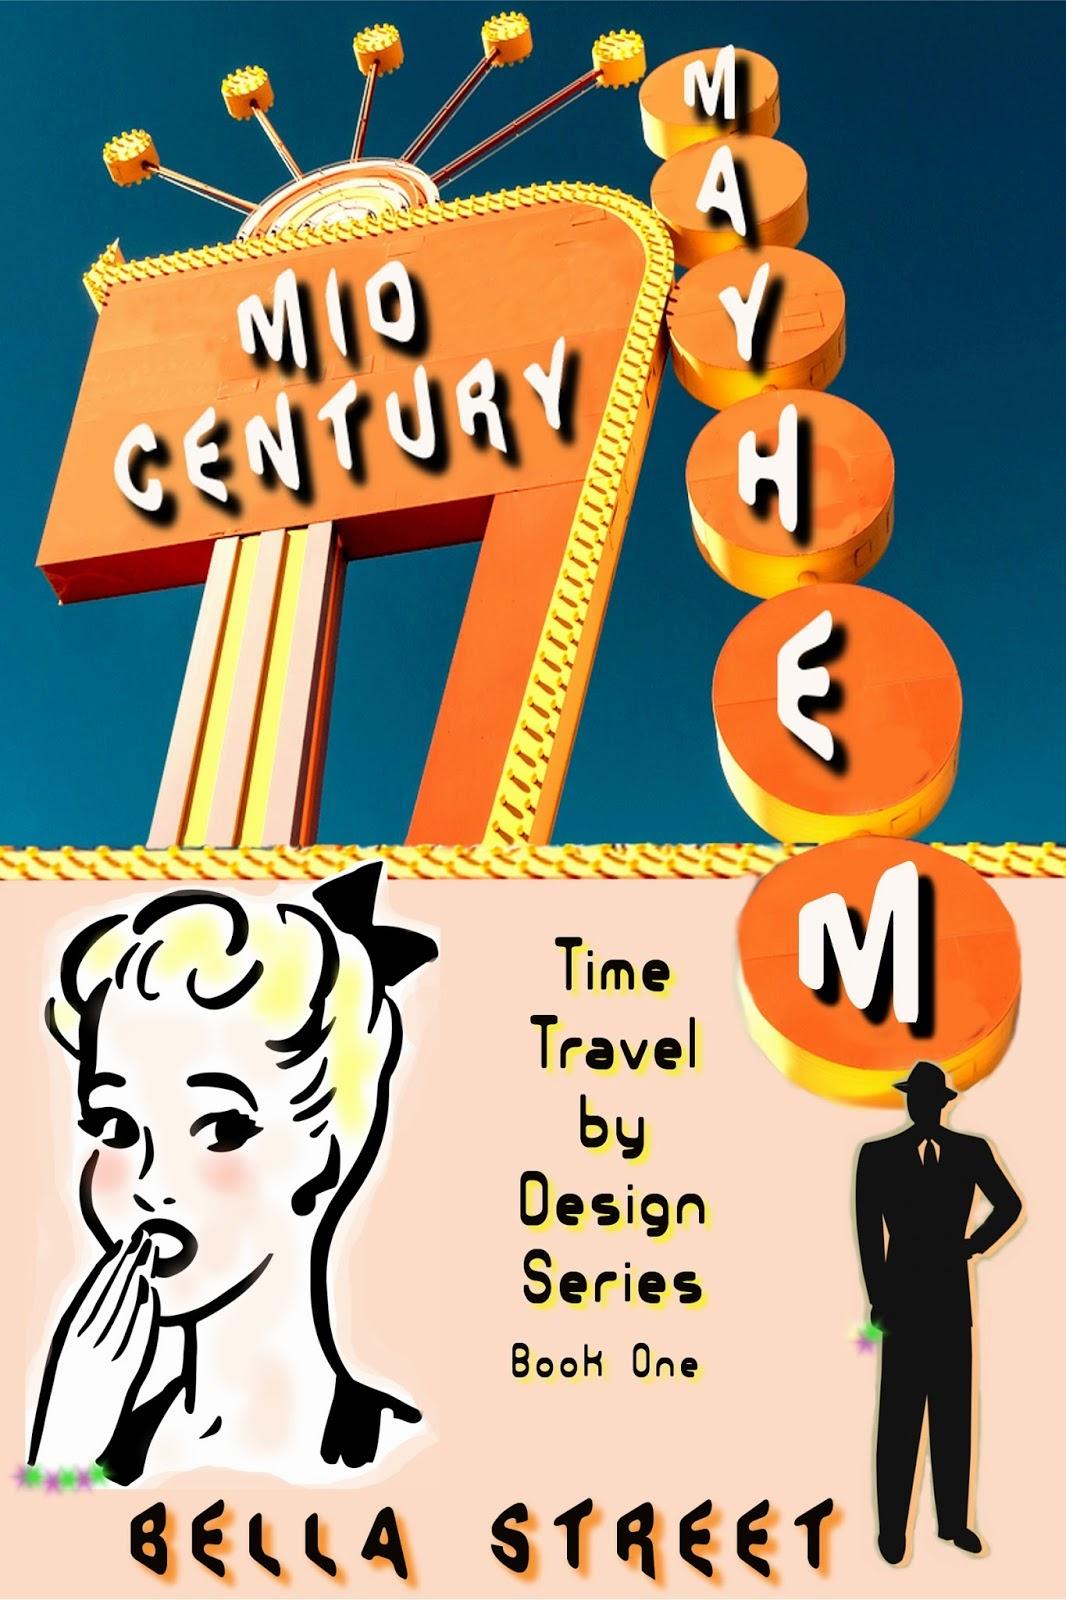 http://www.amazon.com/Mid-Century-Mayhem-Time-Travel-Romance-Presents-ebook/dp/B00QNCBPOY/ref=asap_B004XJ6S2I_1_13?s=books&ie=UTF8&qid=1417903262&sr=1-13